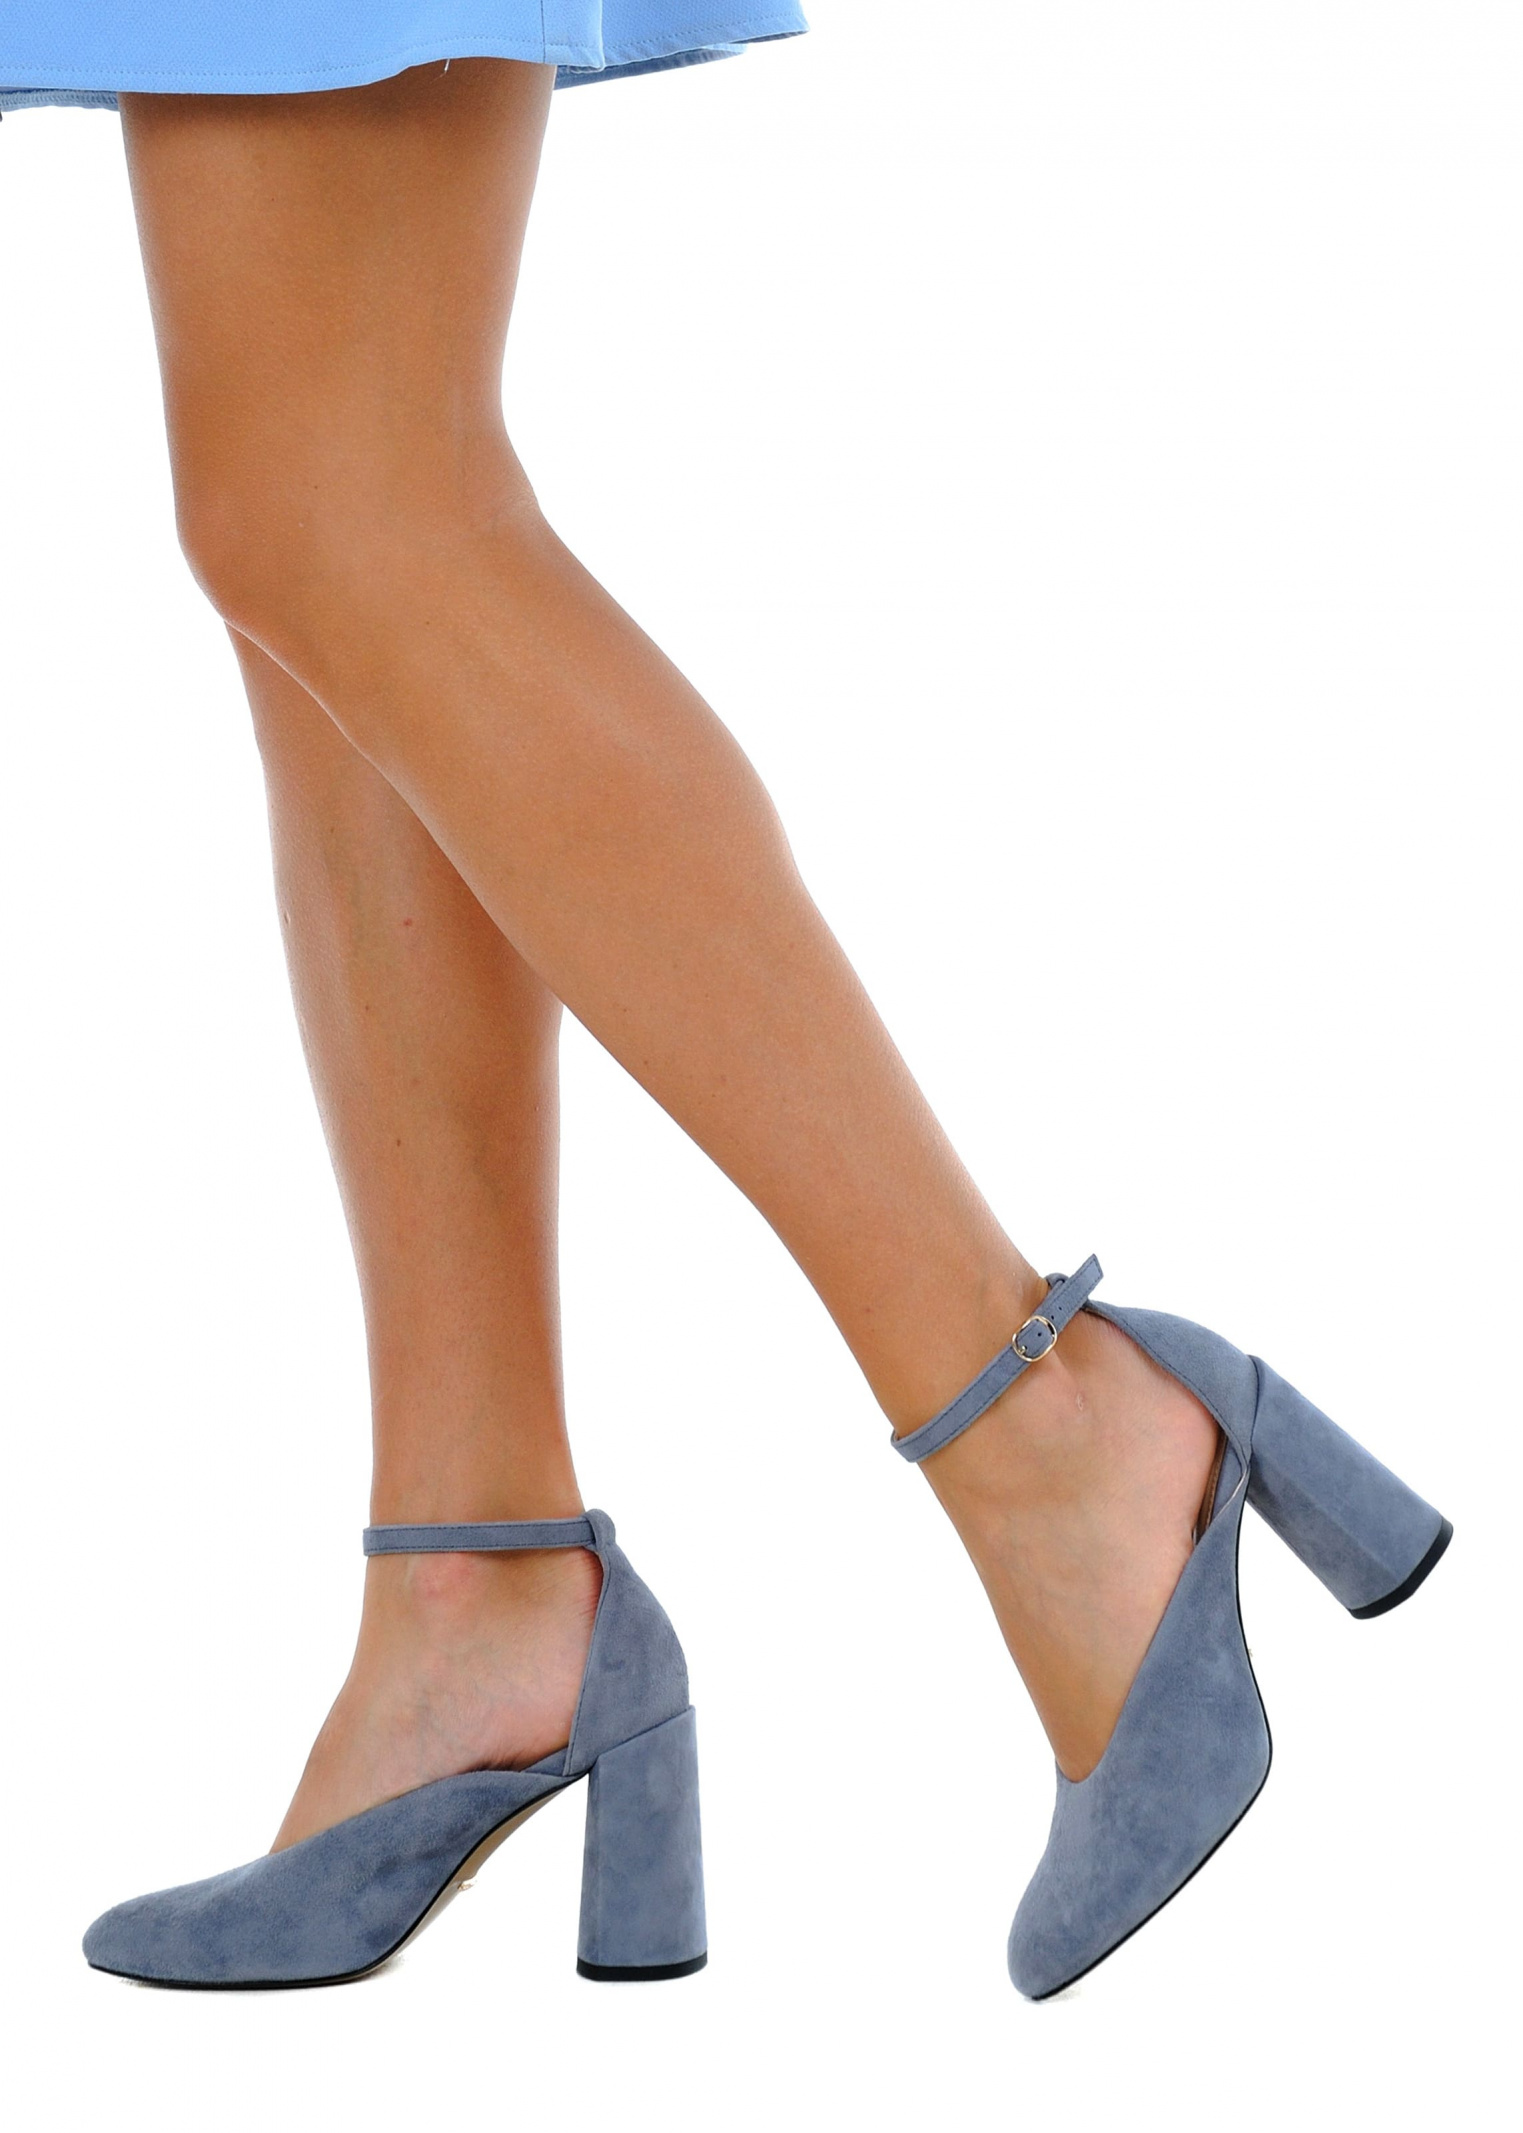 Туфлі  для жінок 894004 Замшевые голубые туфли Modus Vivendi 894004 фото, купити, 2017